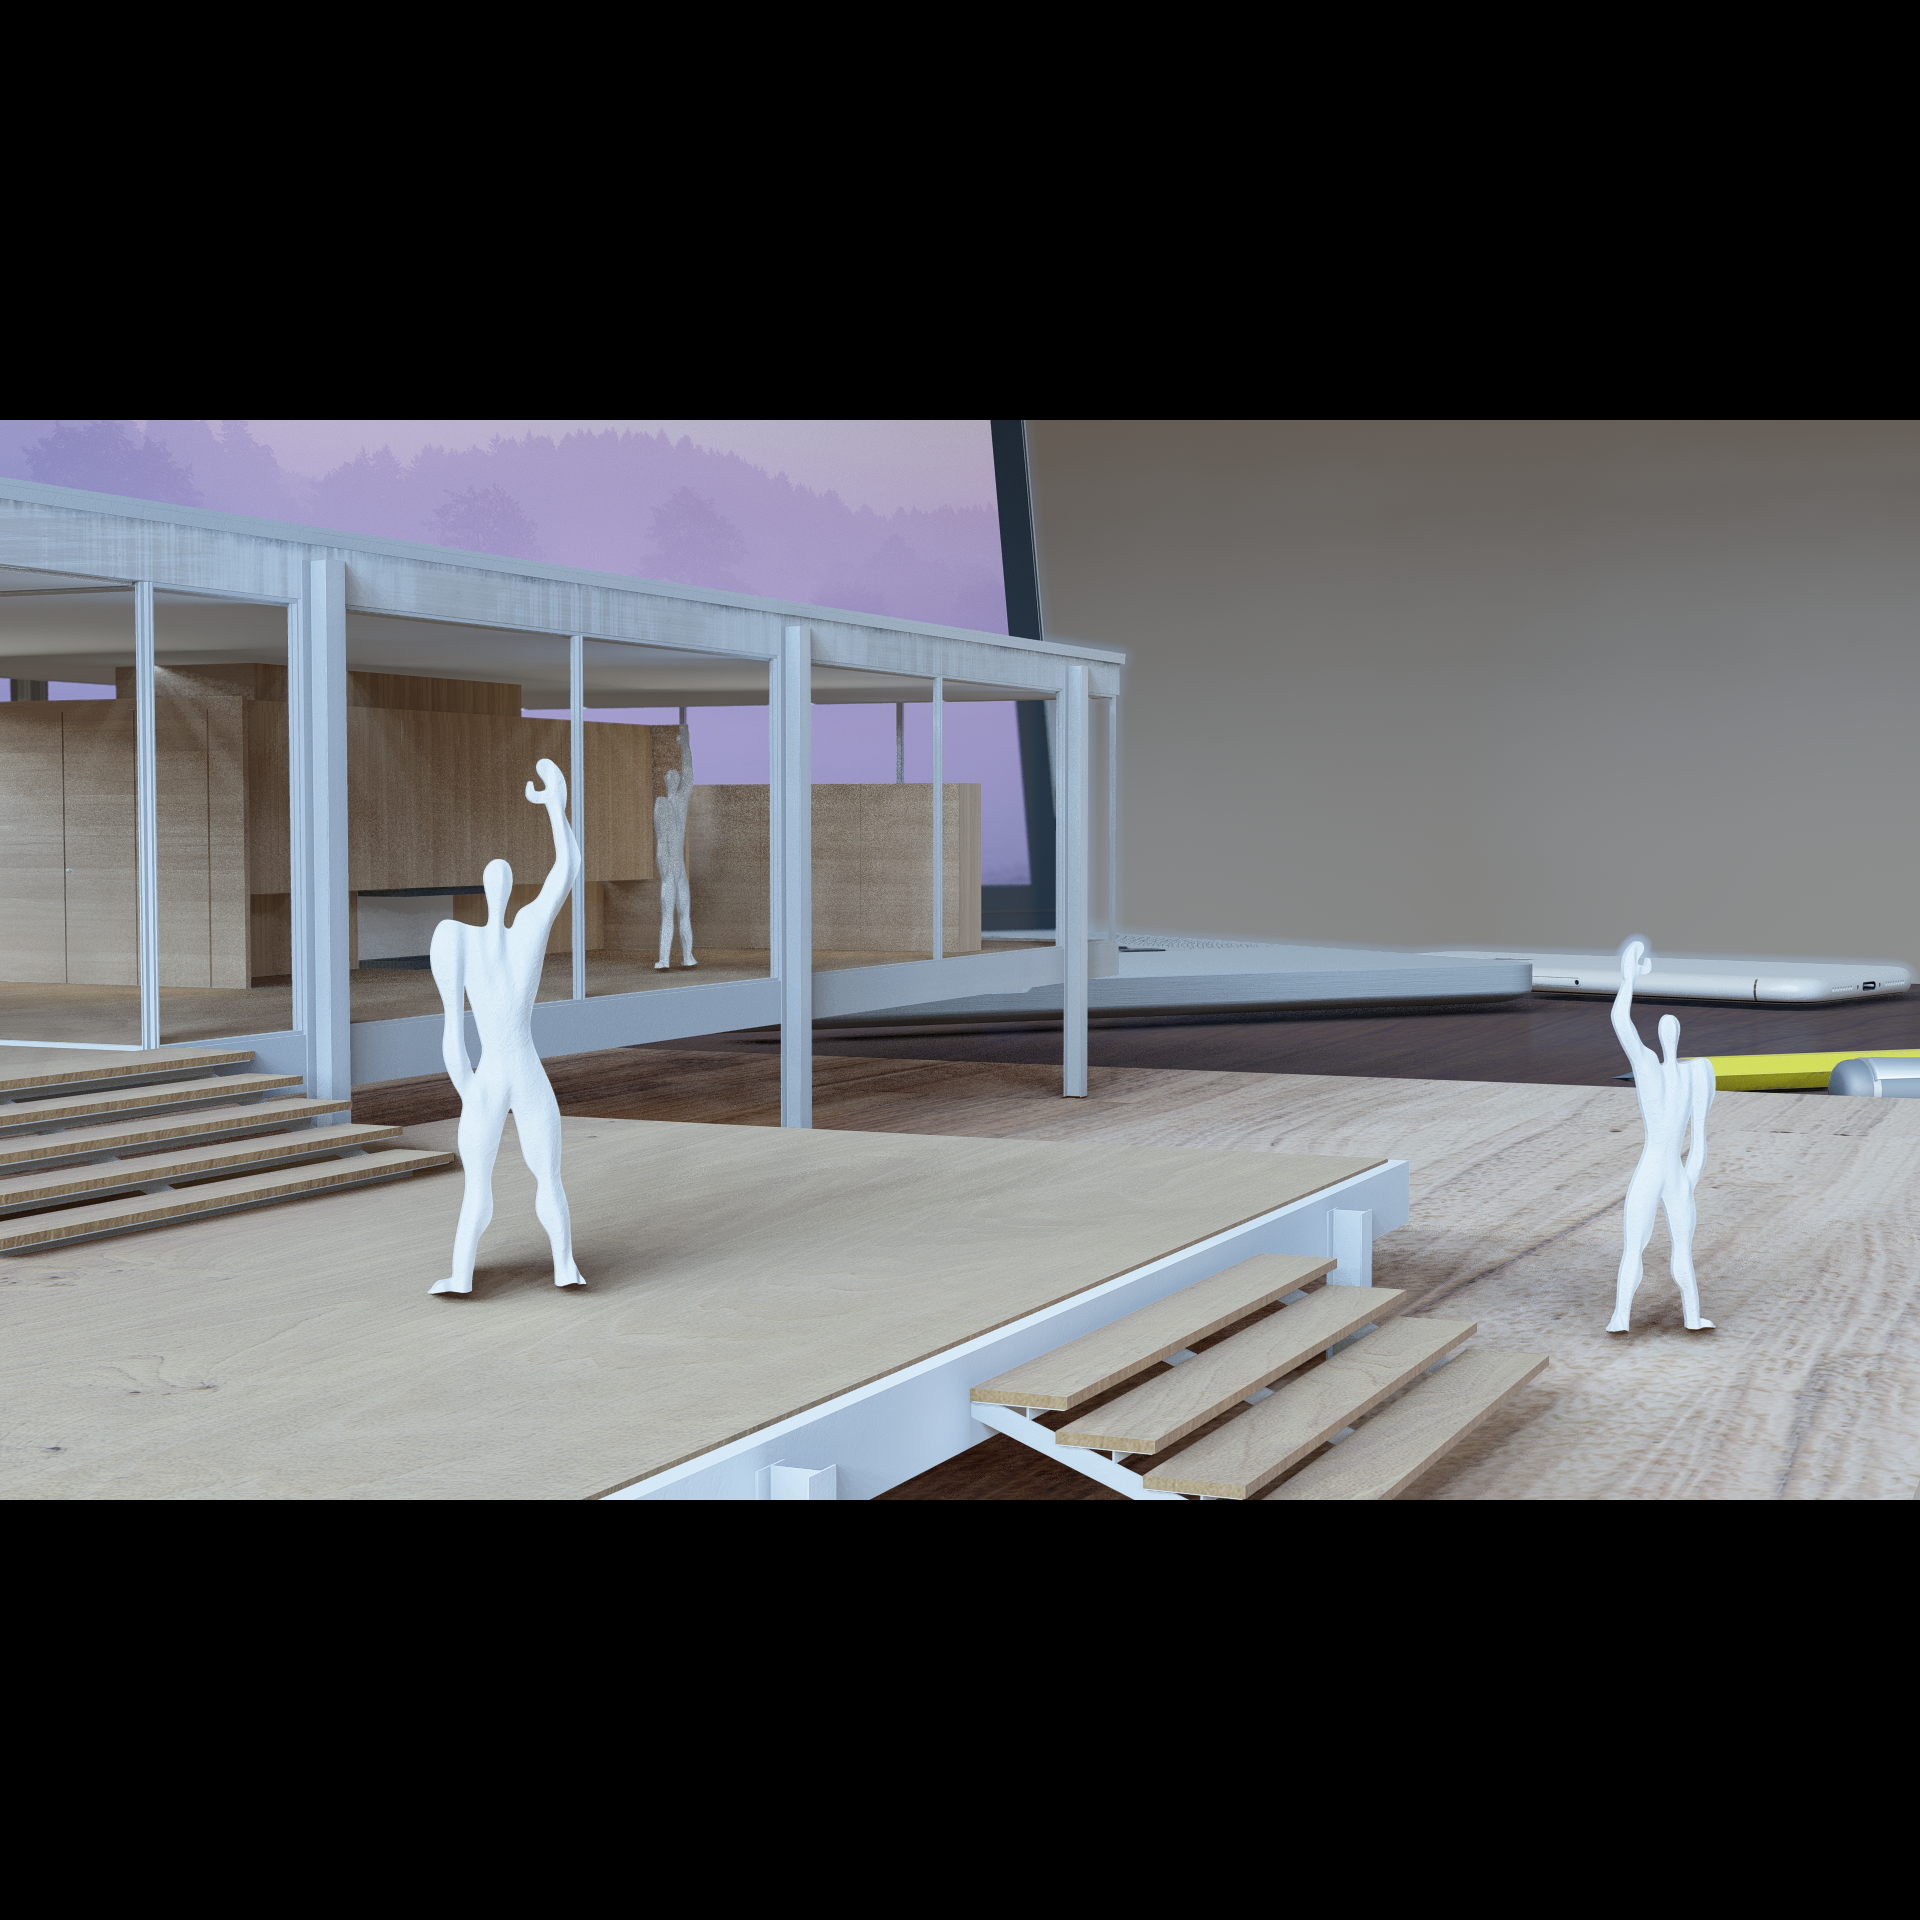 MODULOR 1.png Download STL file MODULOR HUMAN SCALE- HUMAN SCALE MODULOR • 3D printer template, jcorredor